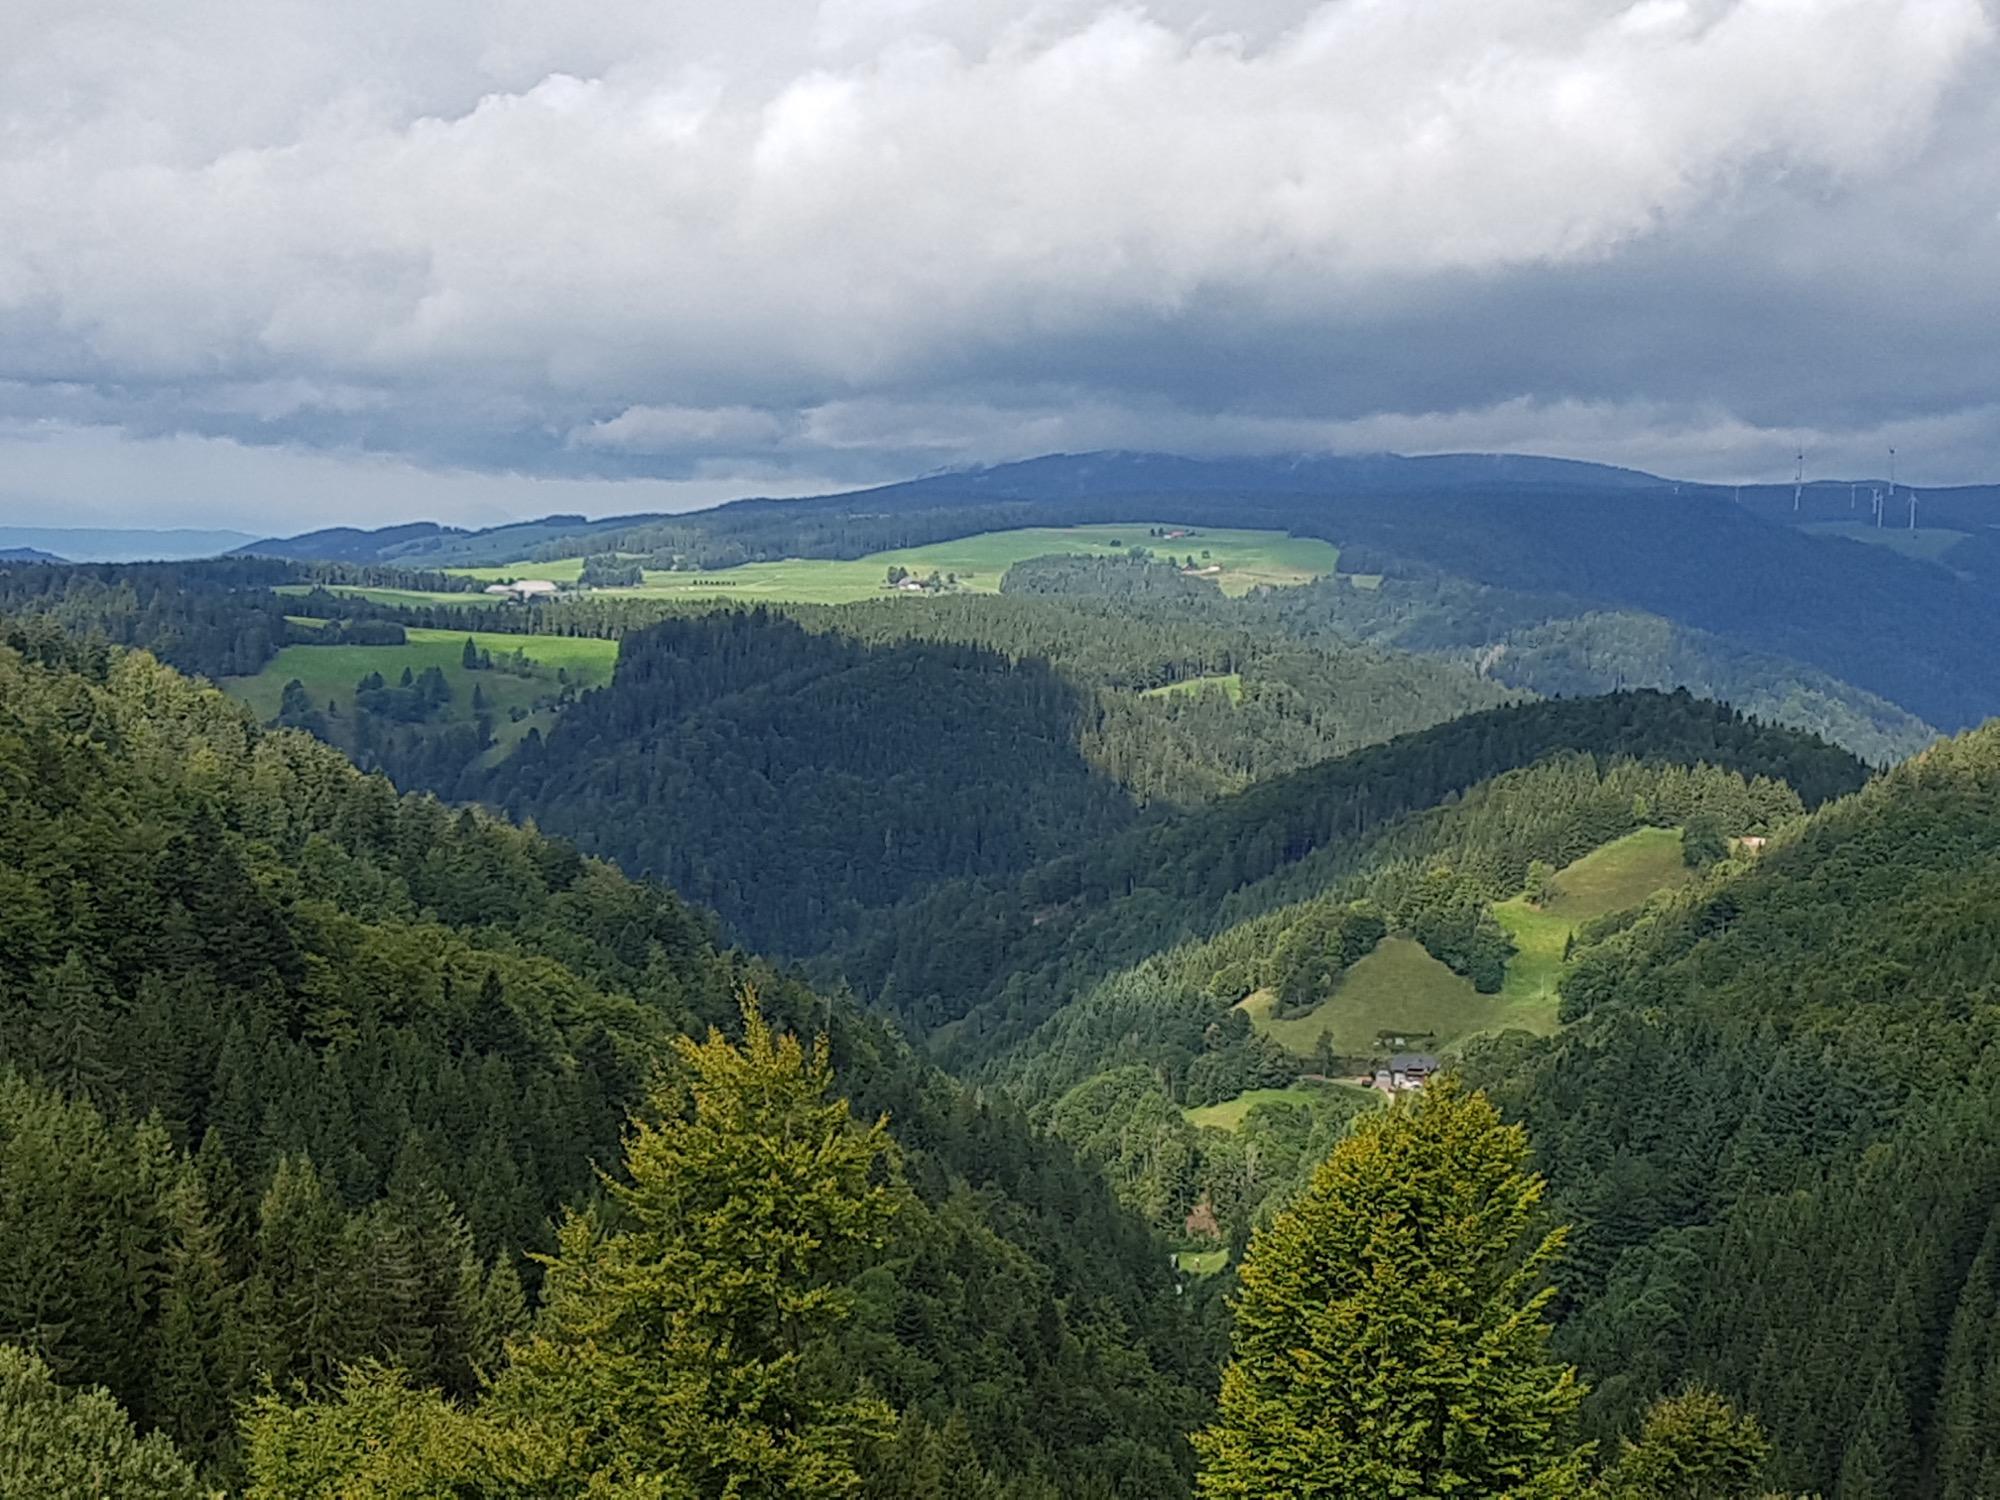 2021-4-29-Mühlenbach-privat-FVS-Forst-20170906_113313